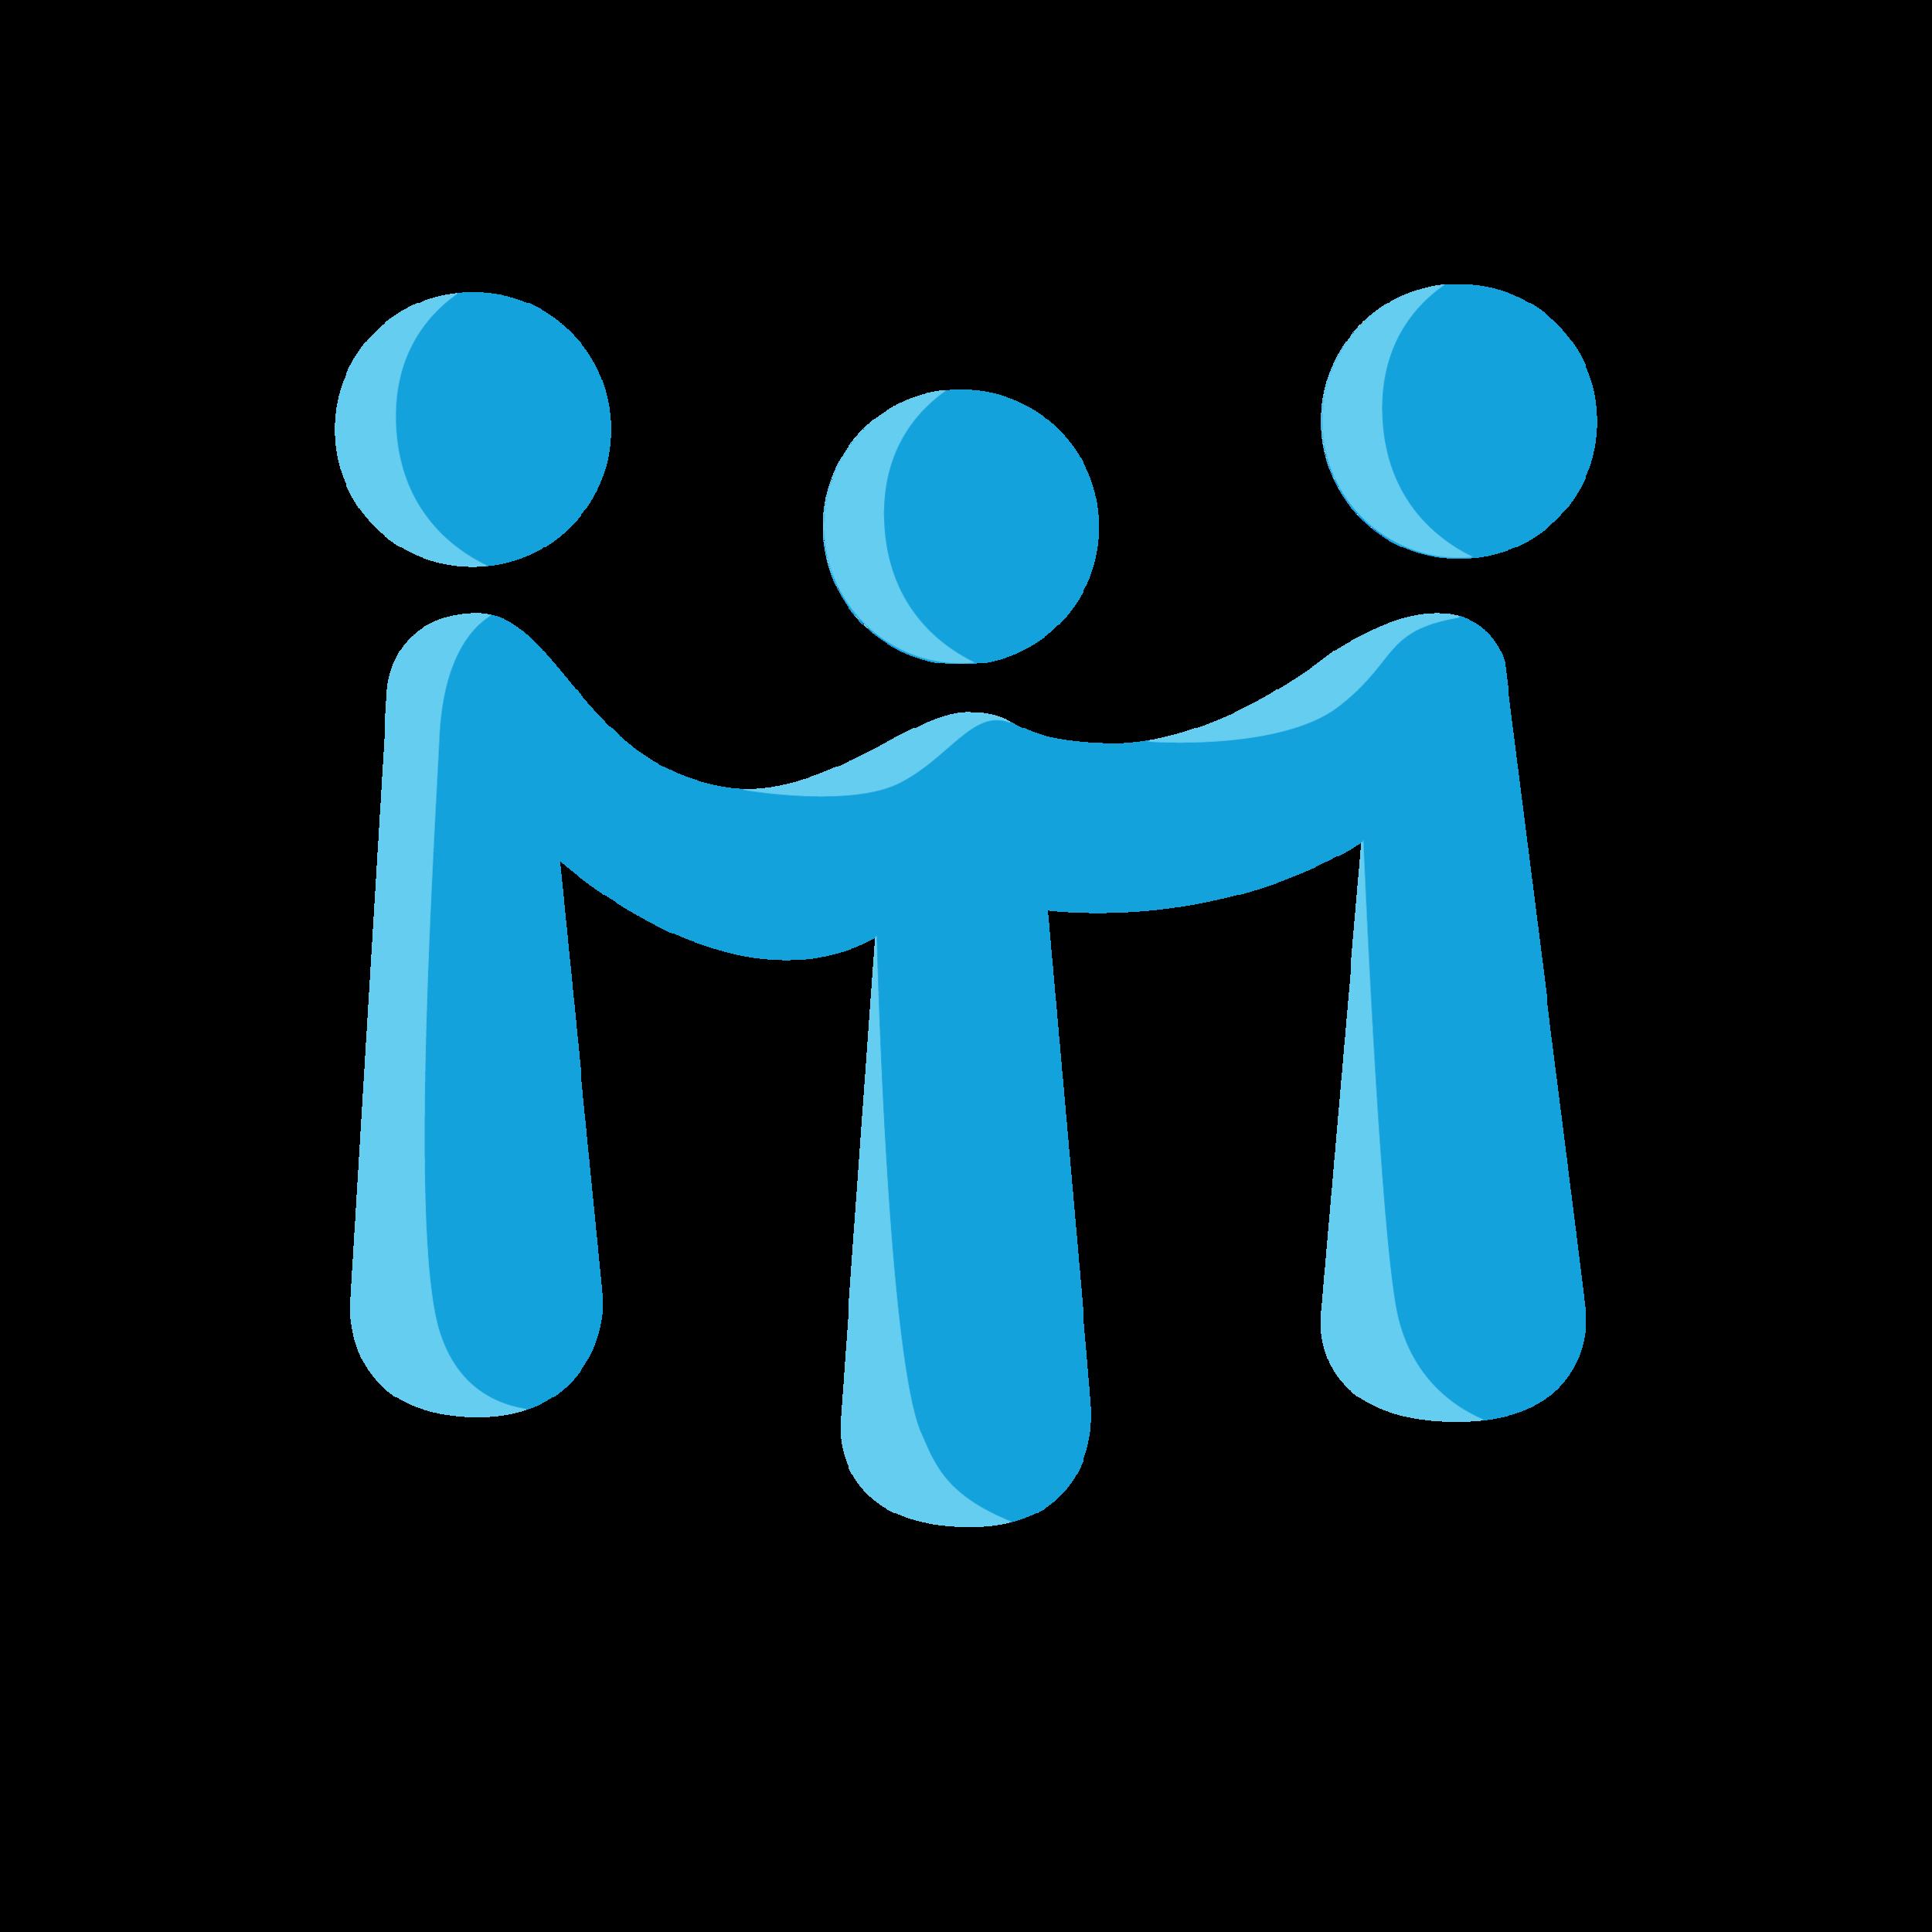 Community_symbol-02.png